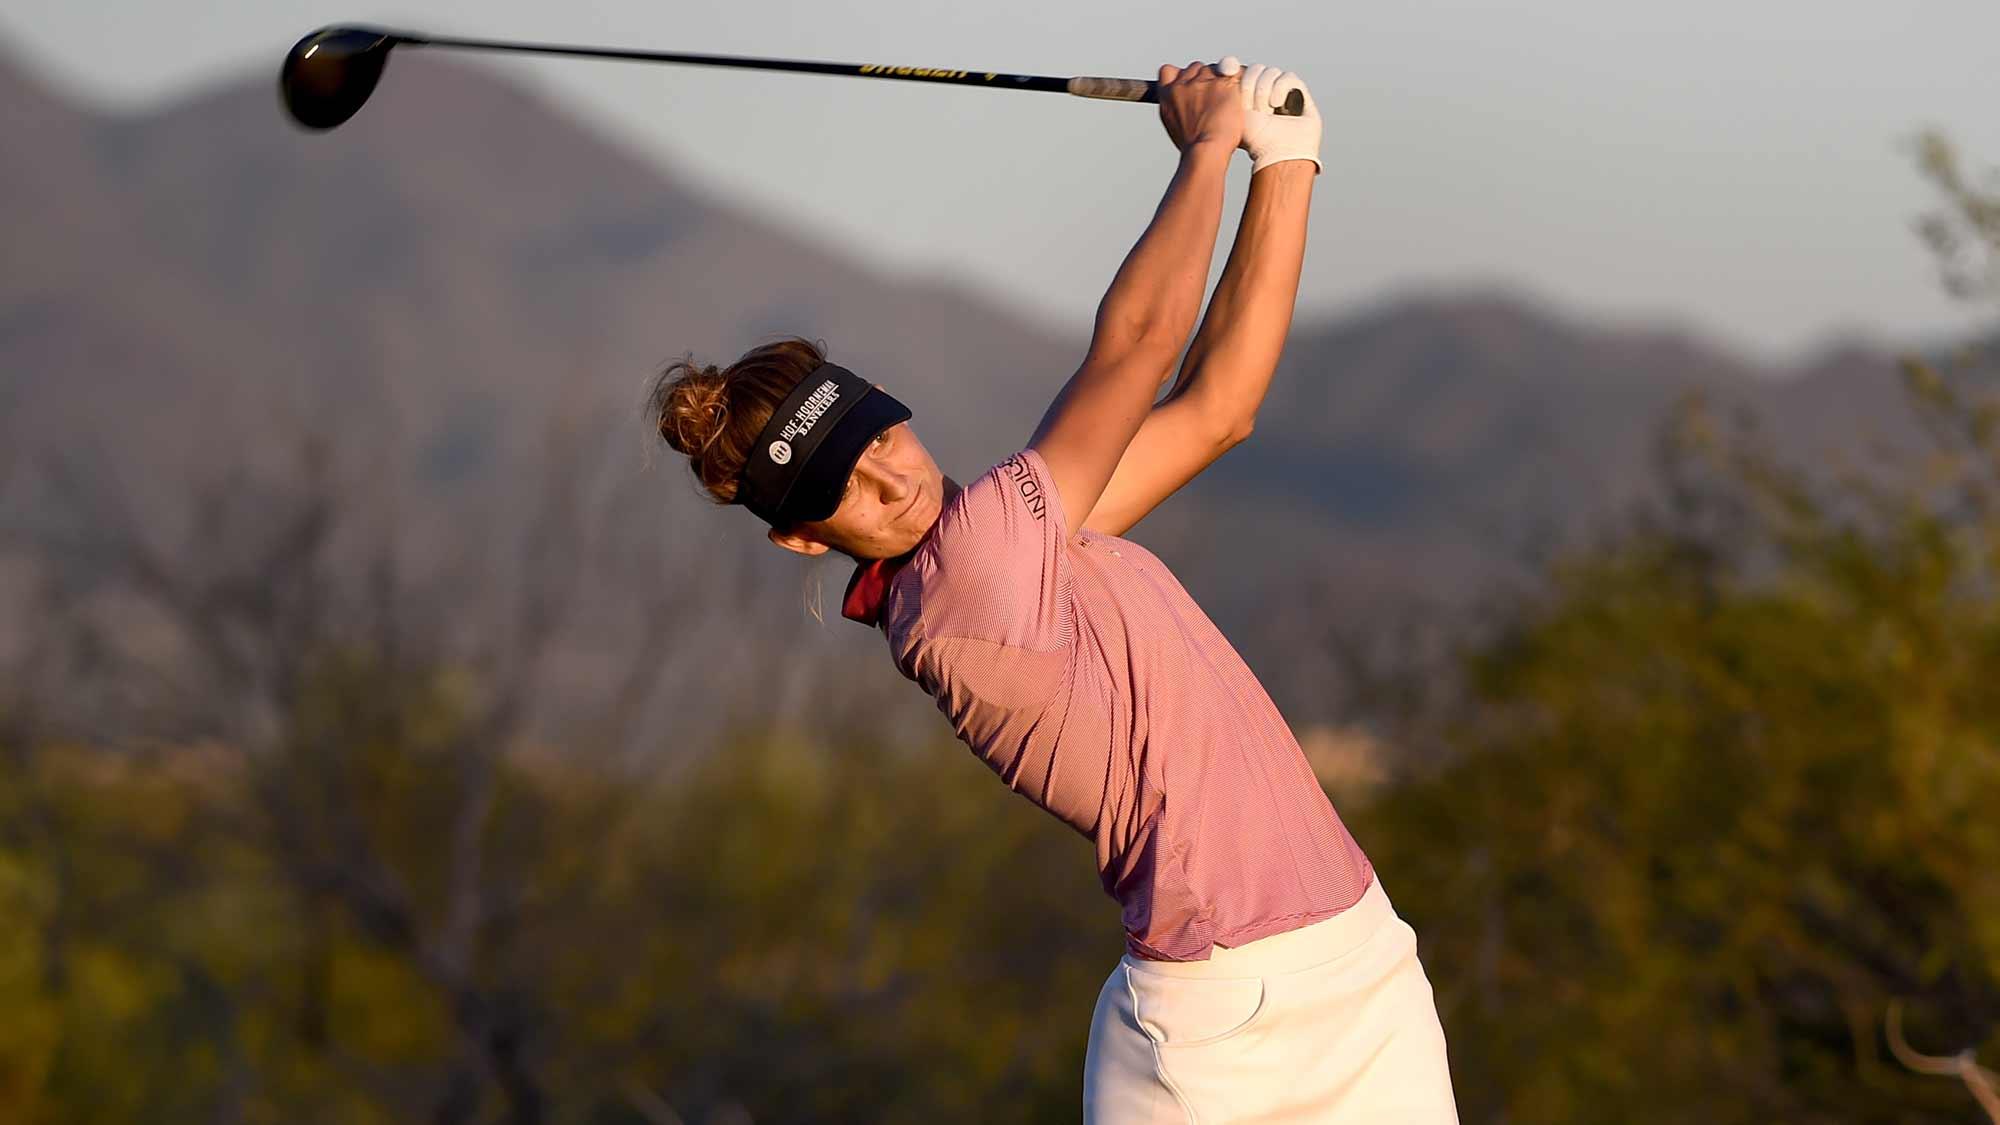 Sirak: The Distance Revolution Has Arrived | LPGA | Ladies Professional Golf Association